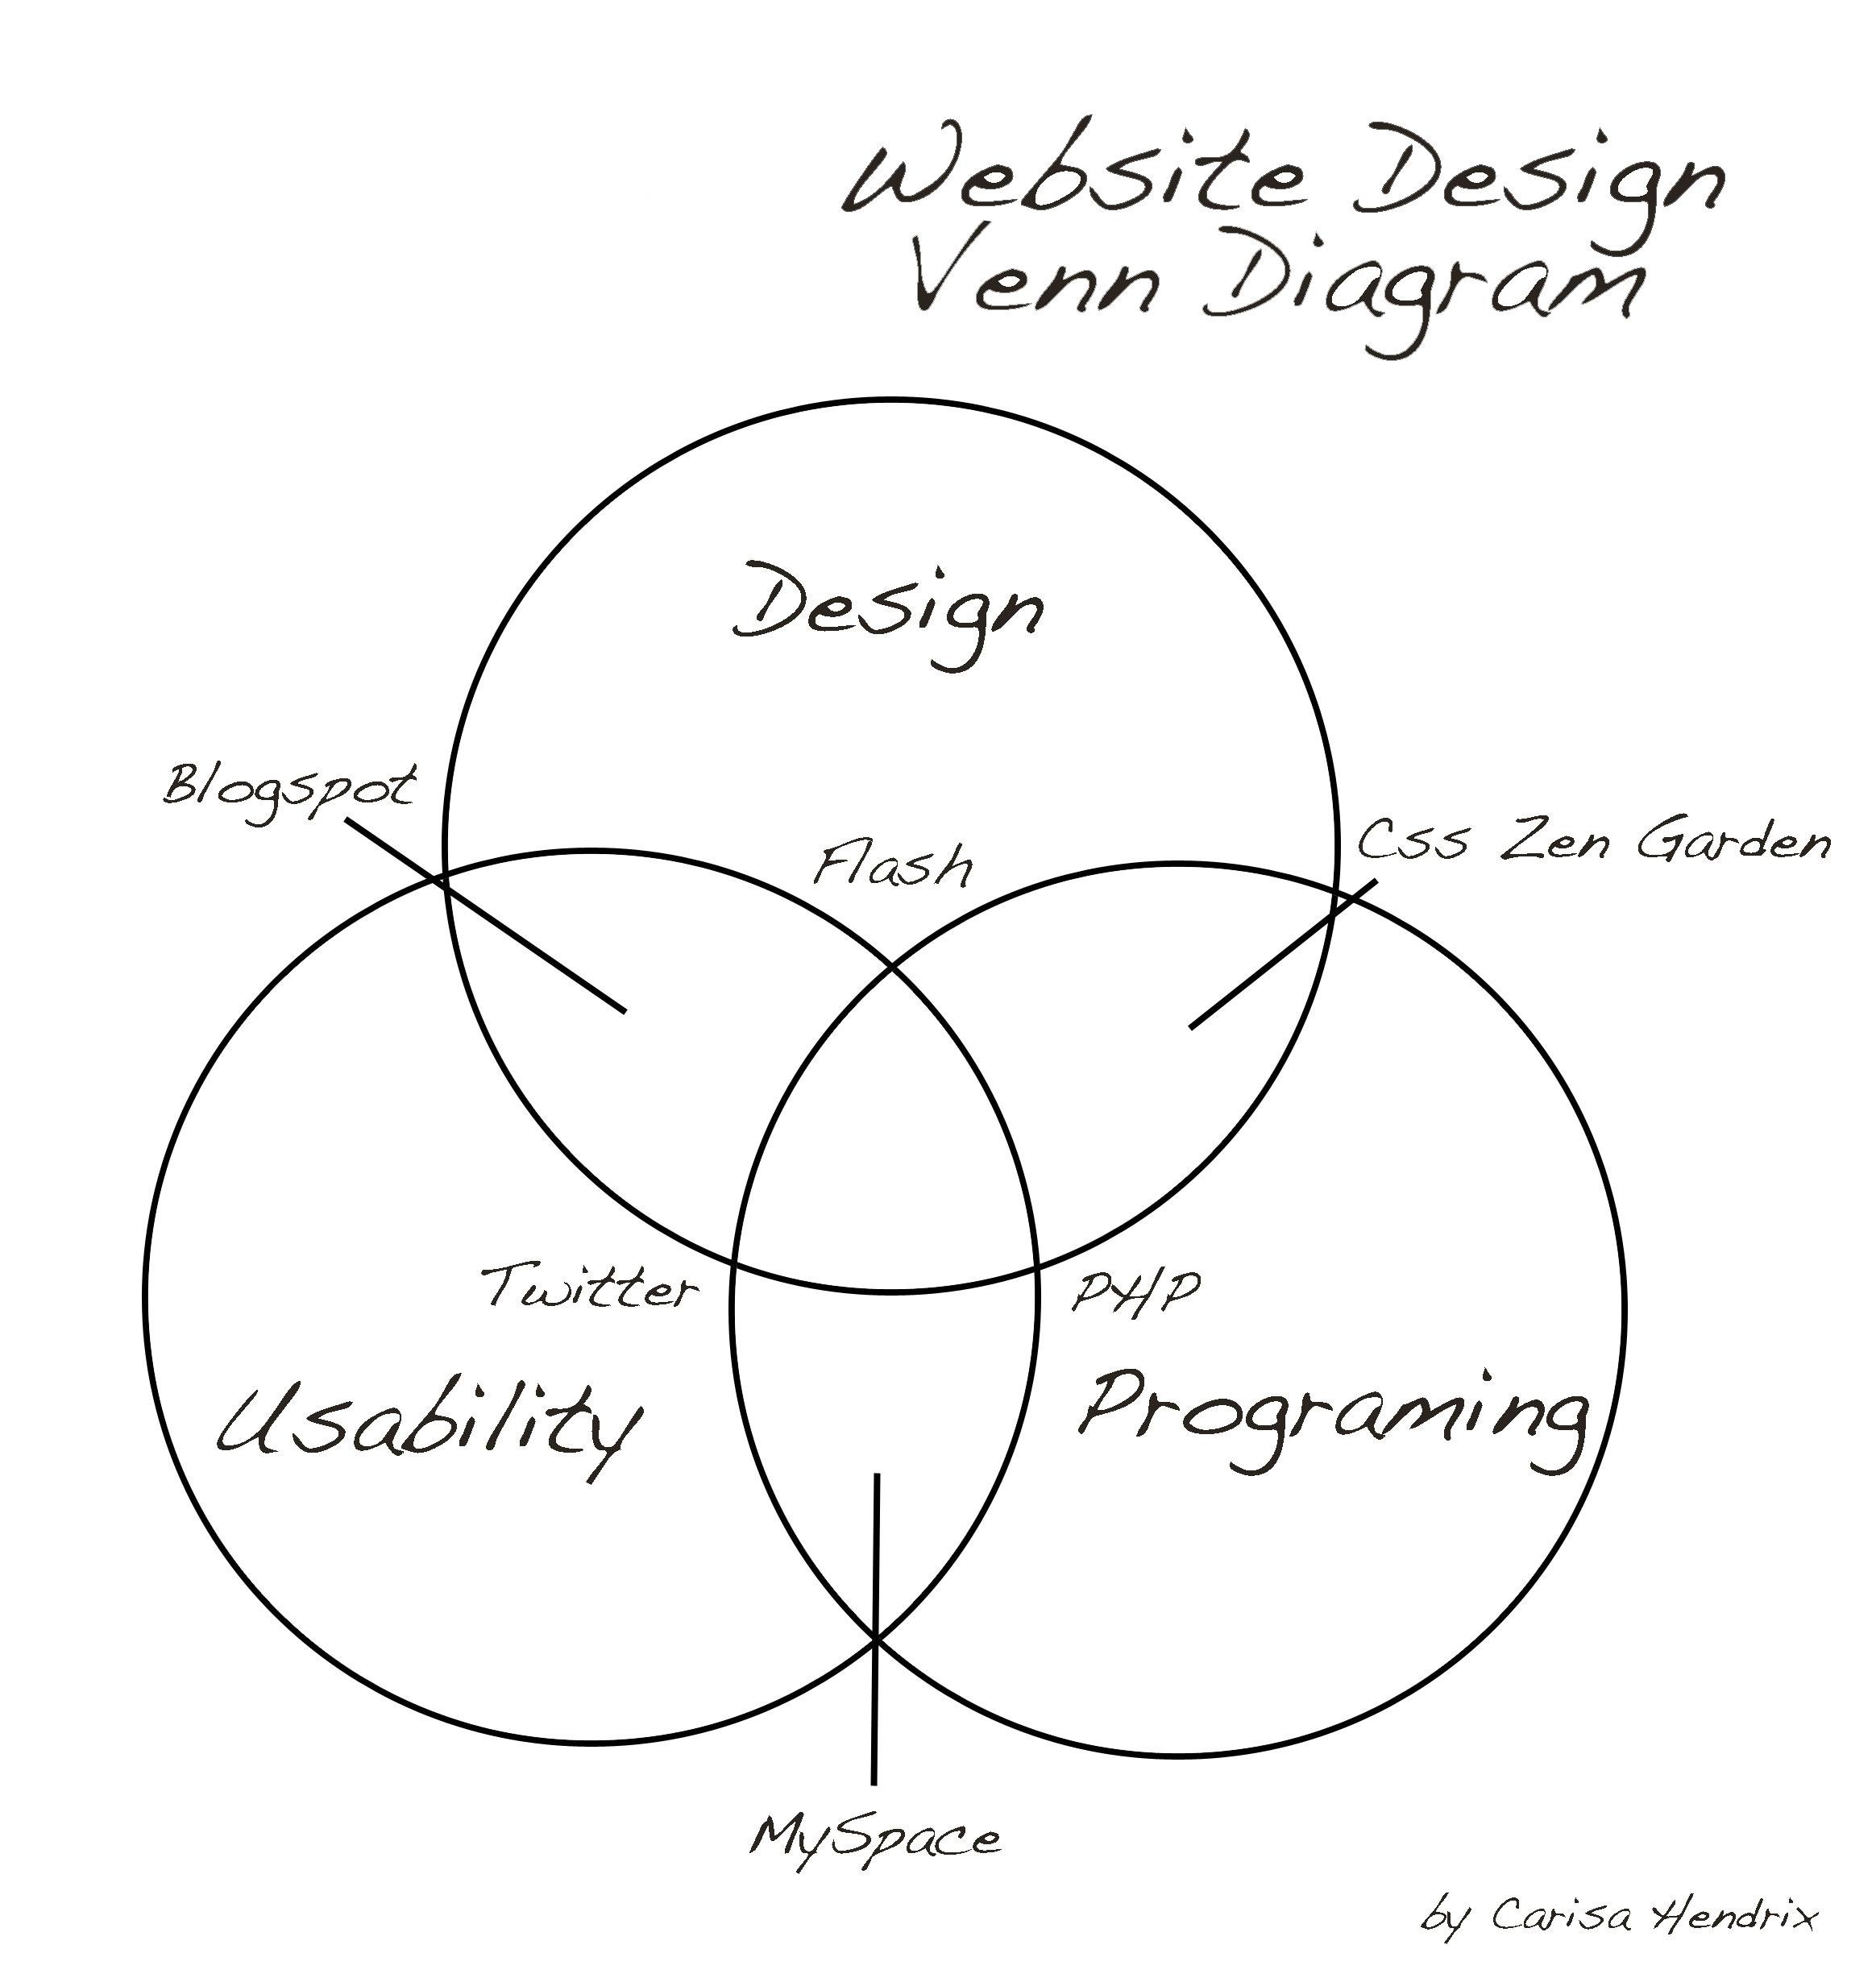 Web Design Venn Diagram